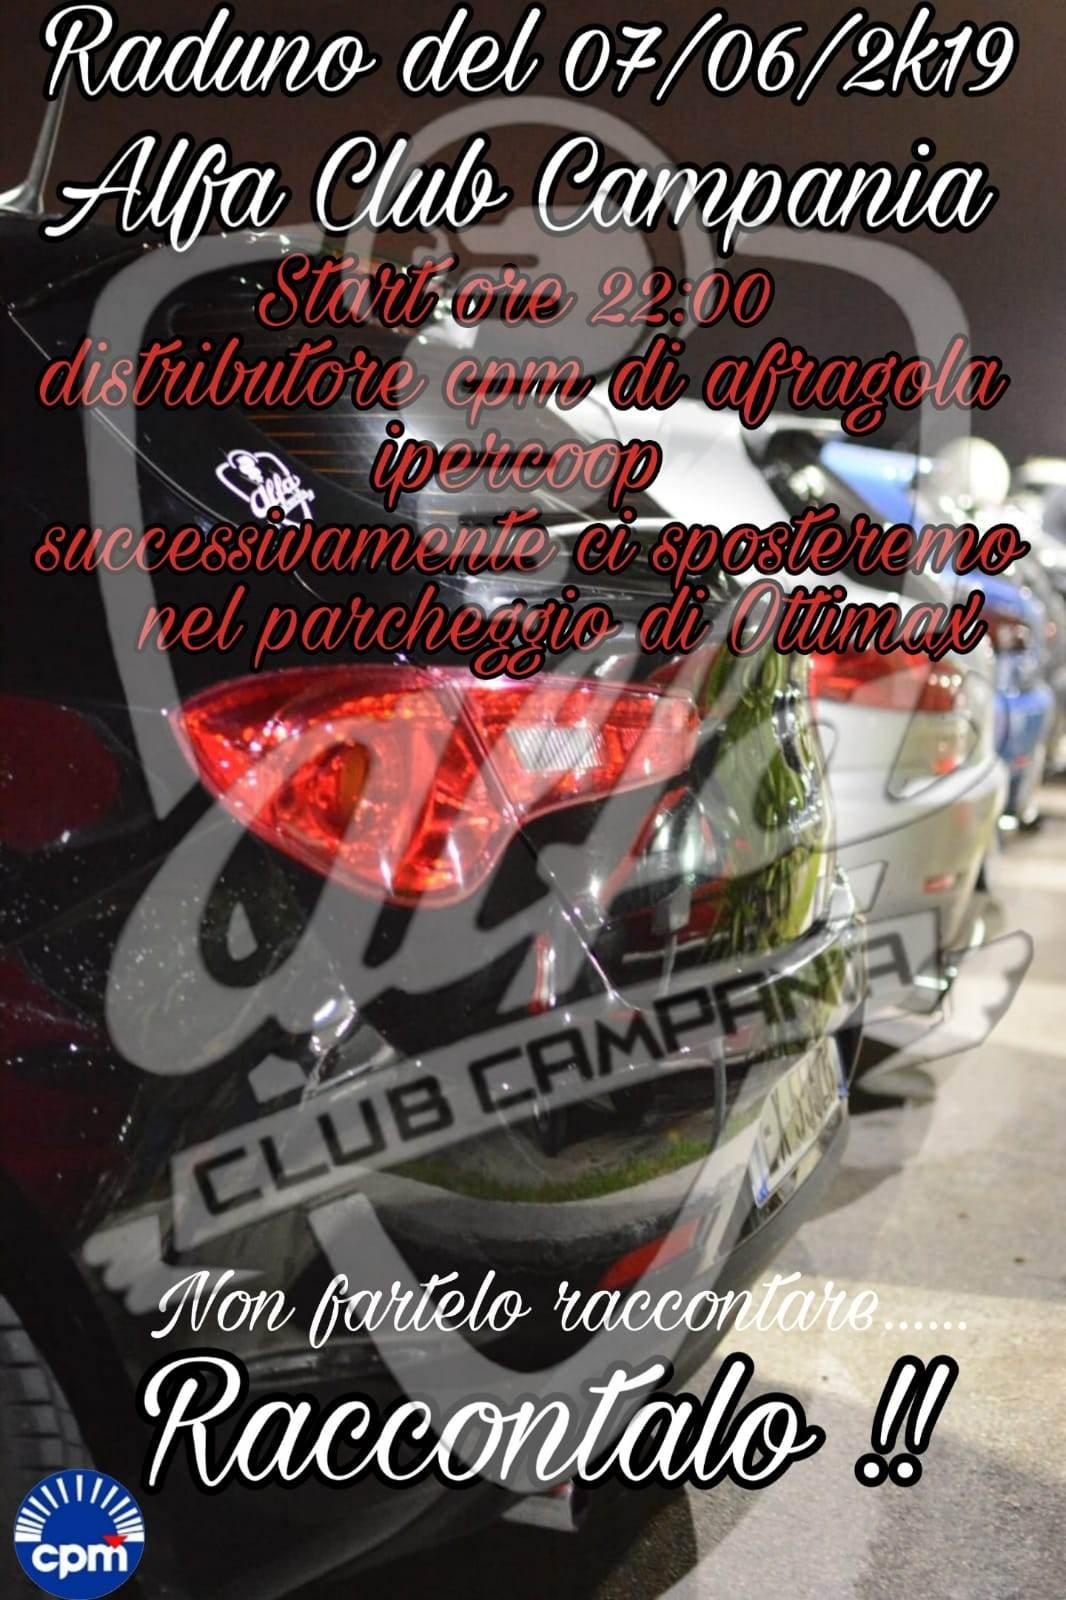 foto Alfa Club Campania - 28